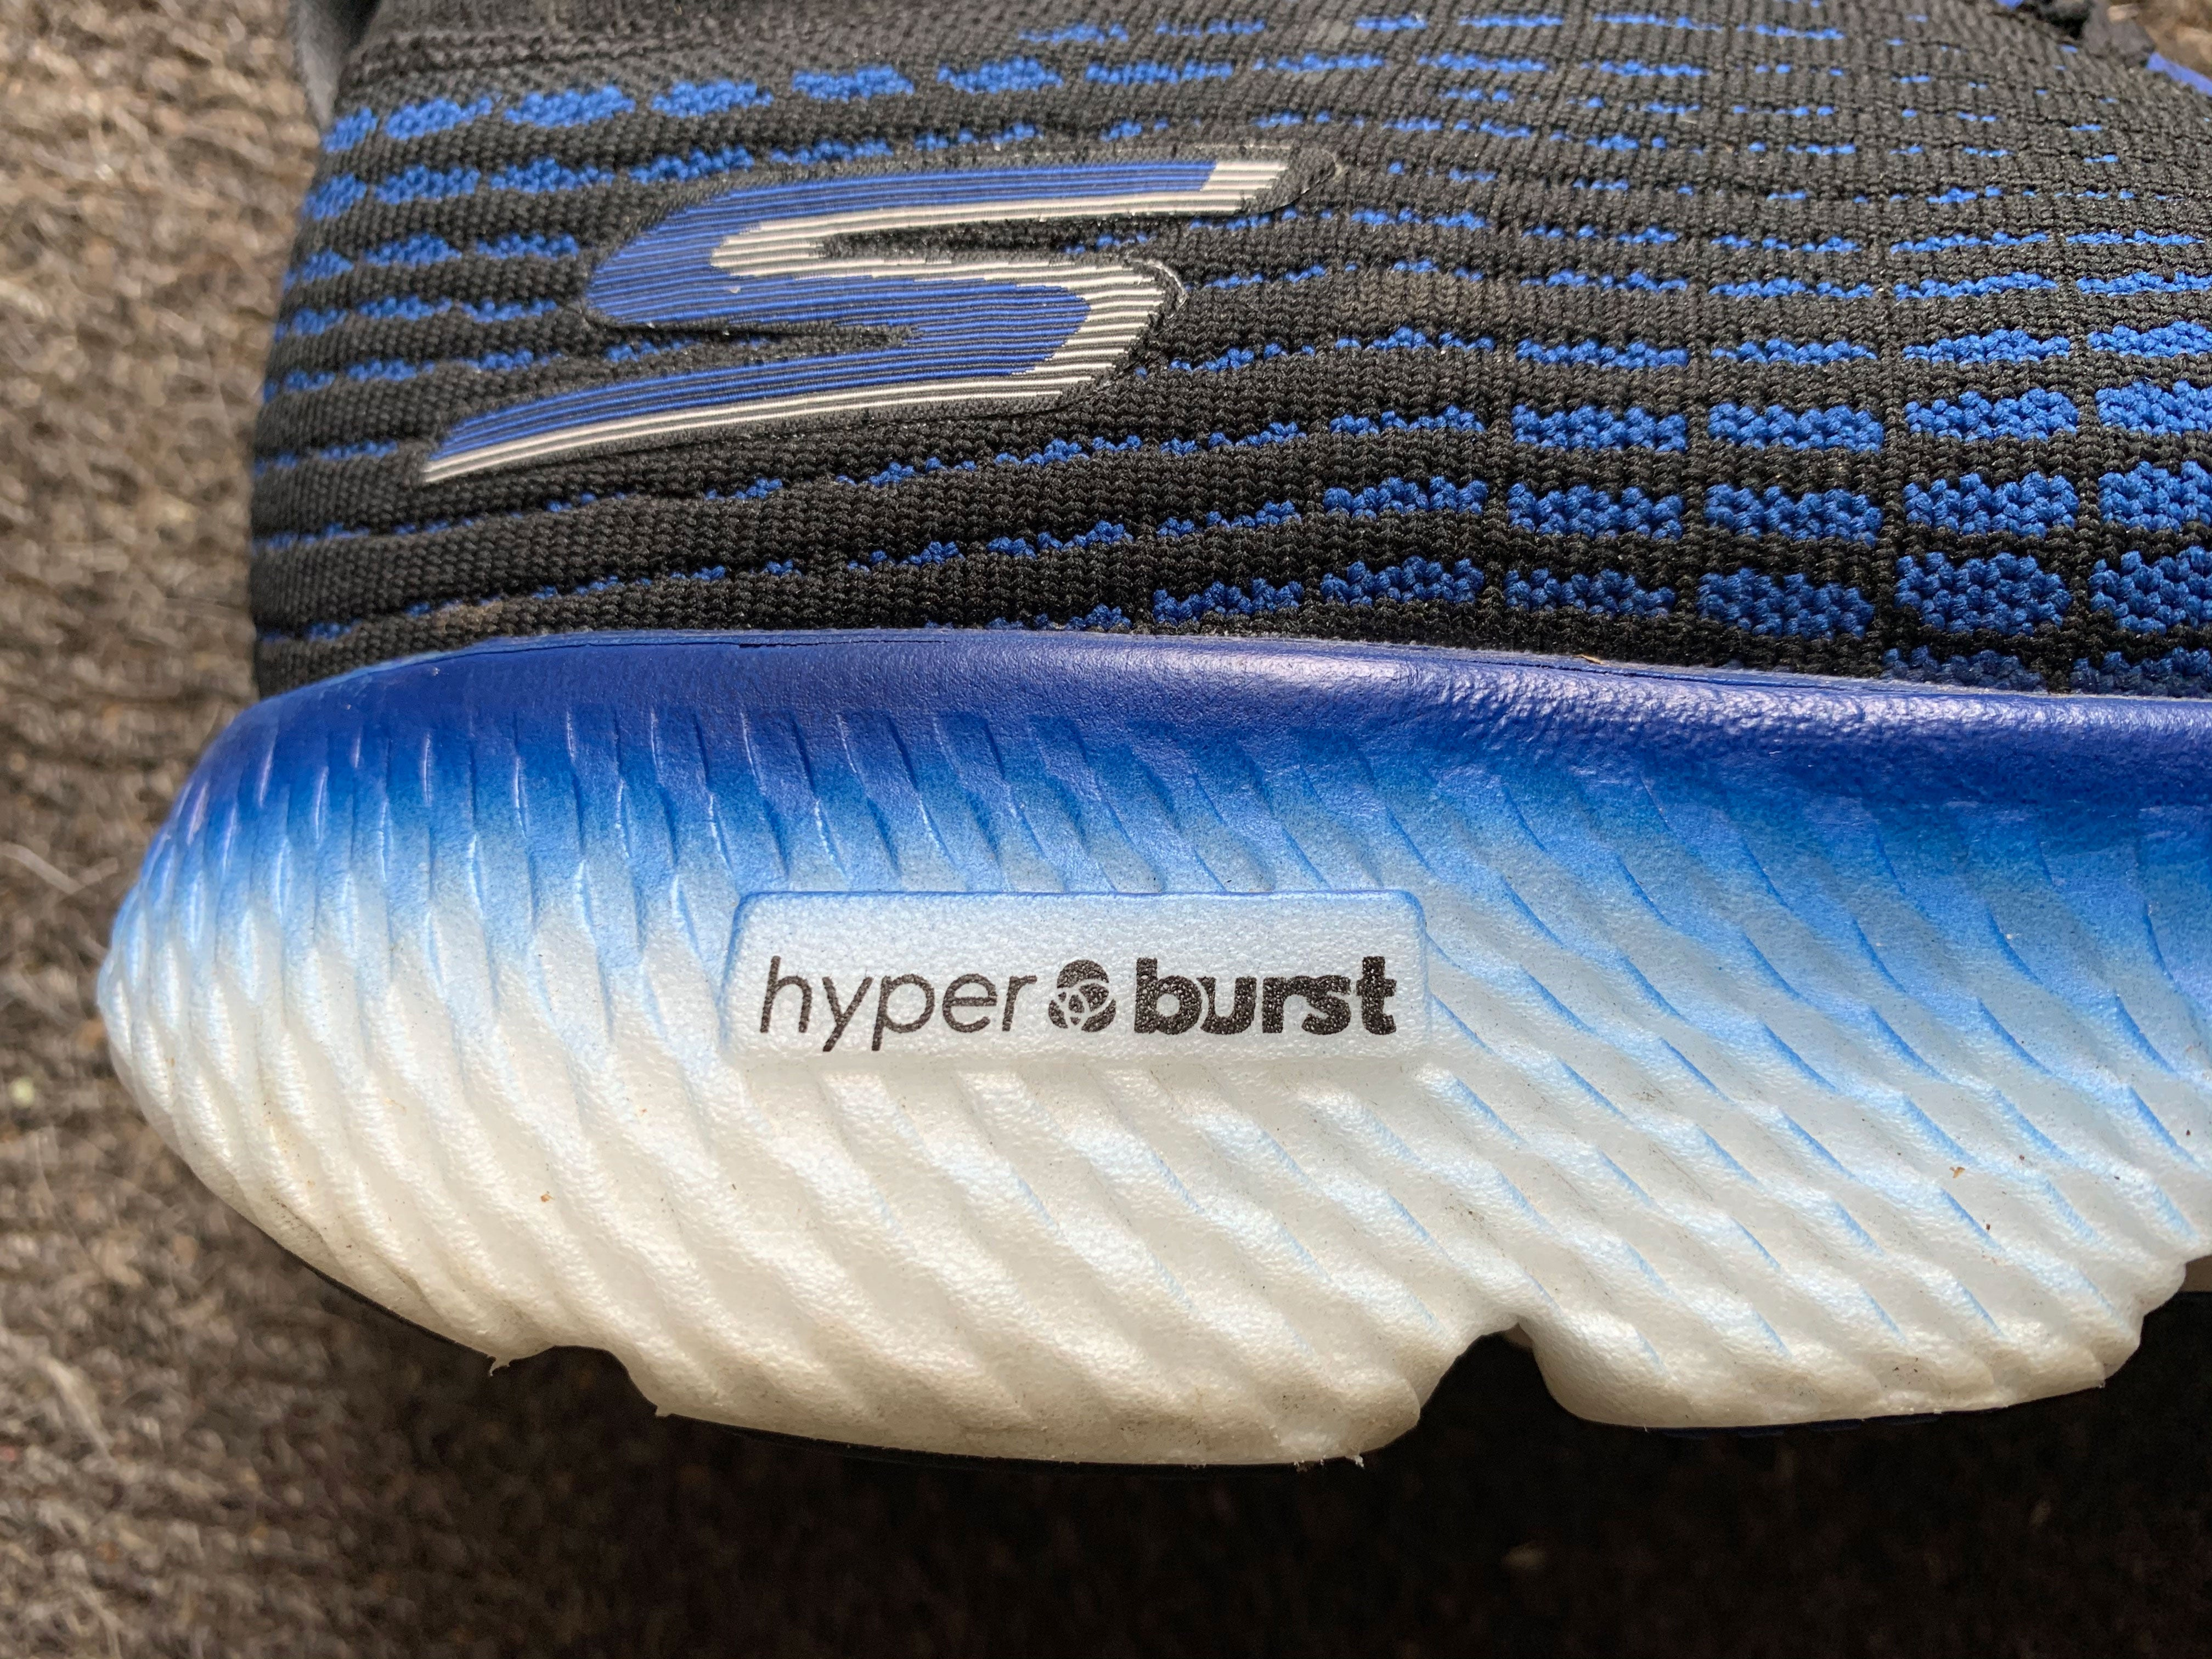 Skechers Hyper Burst midsole